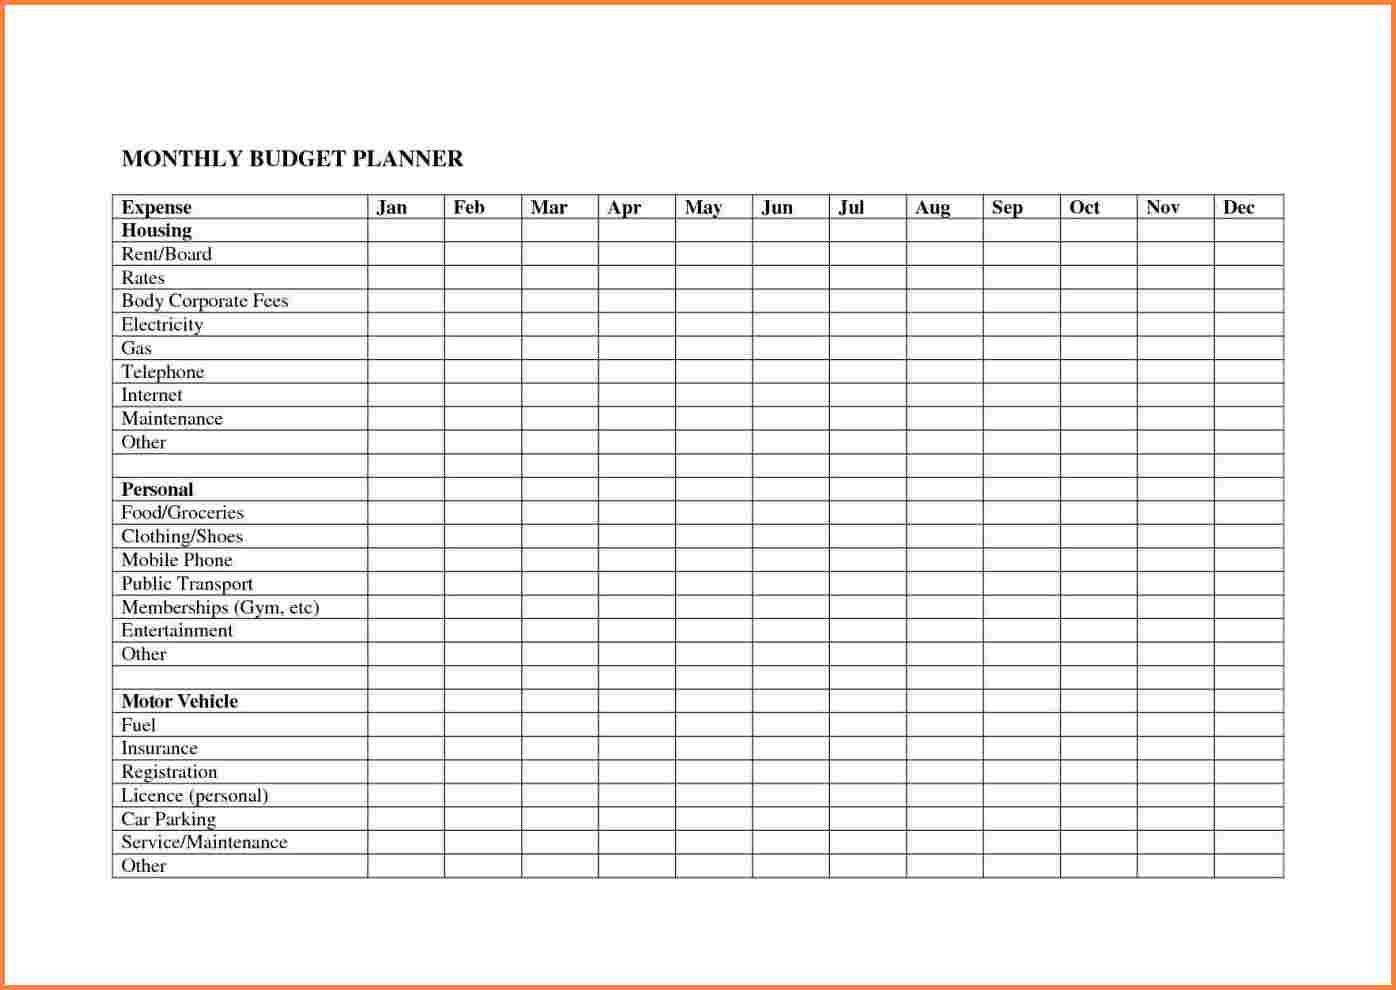 Business Budget Planning Worksheet Monthly Planner Spreadsheet You Inside Business Budget Planner Spreadsheet